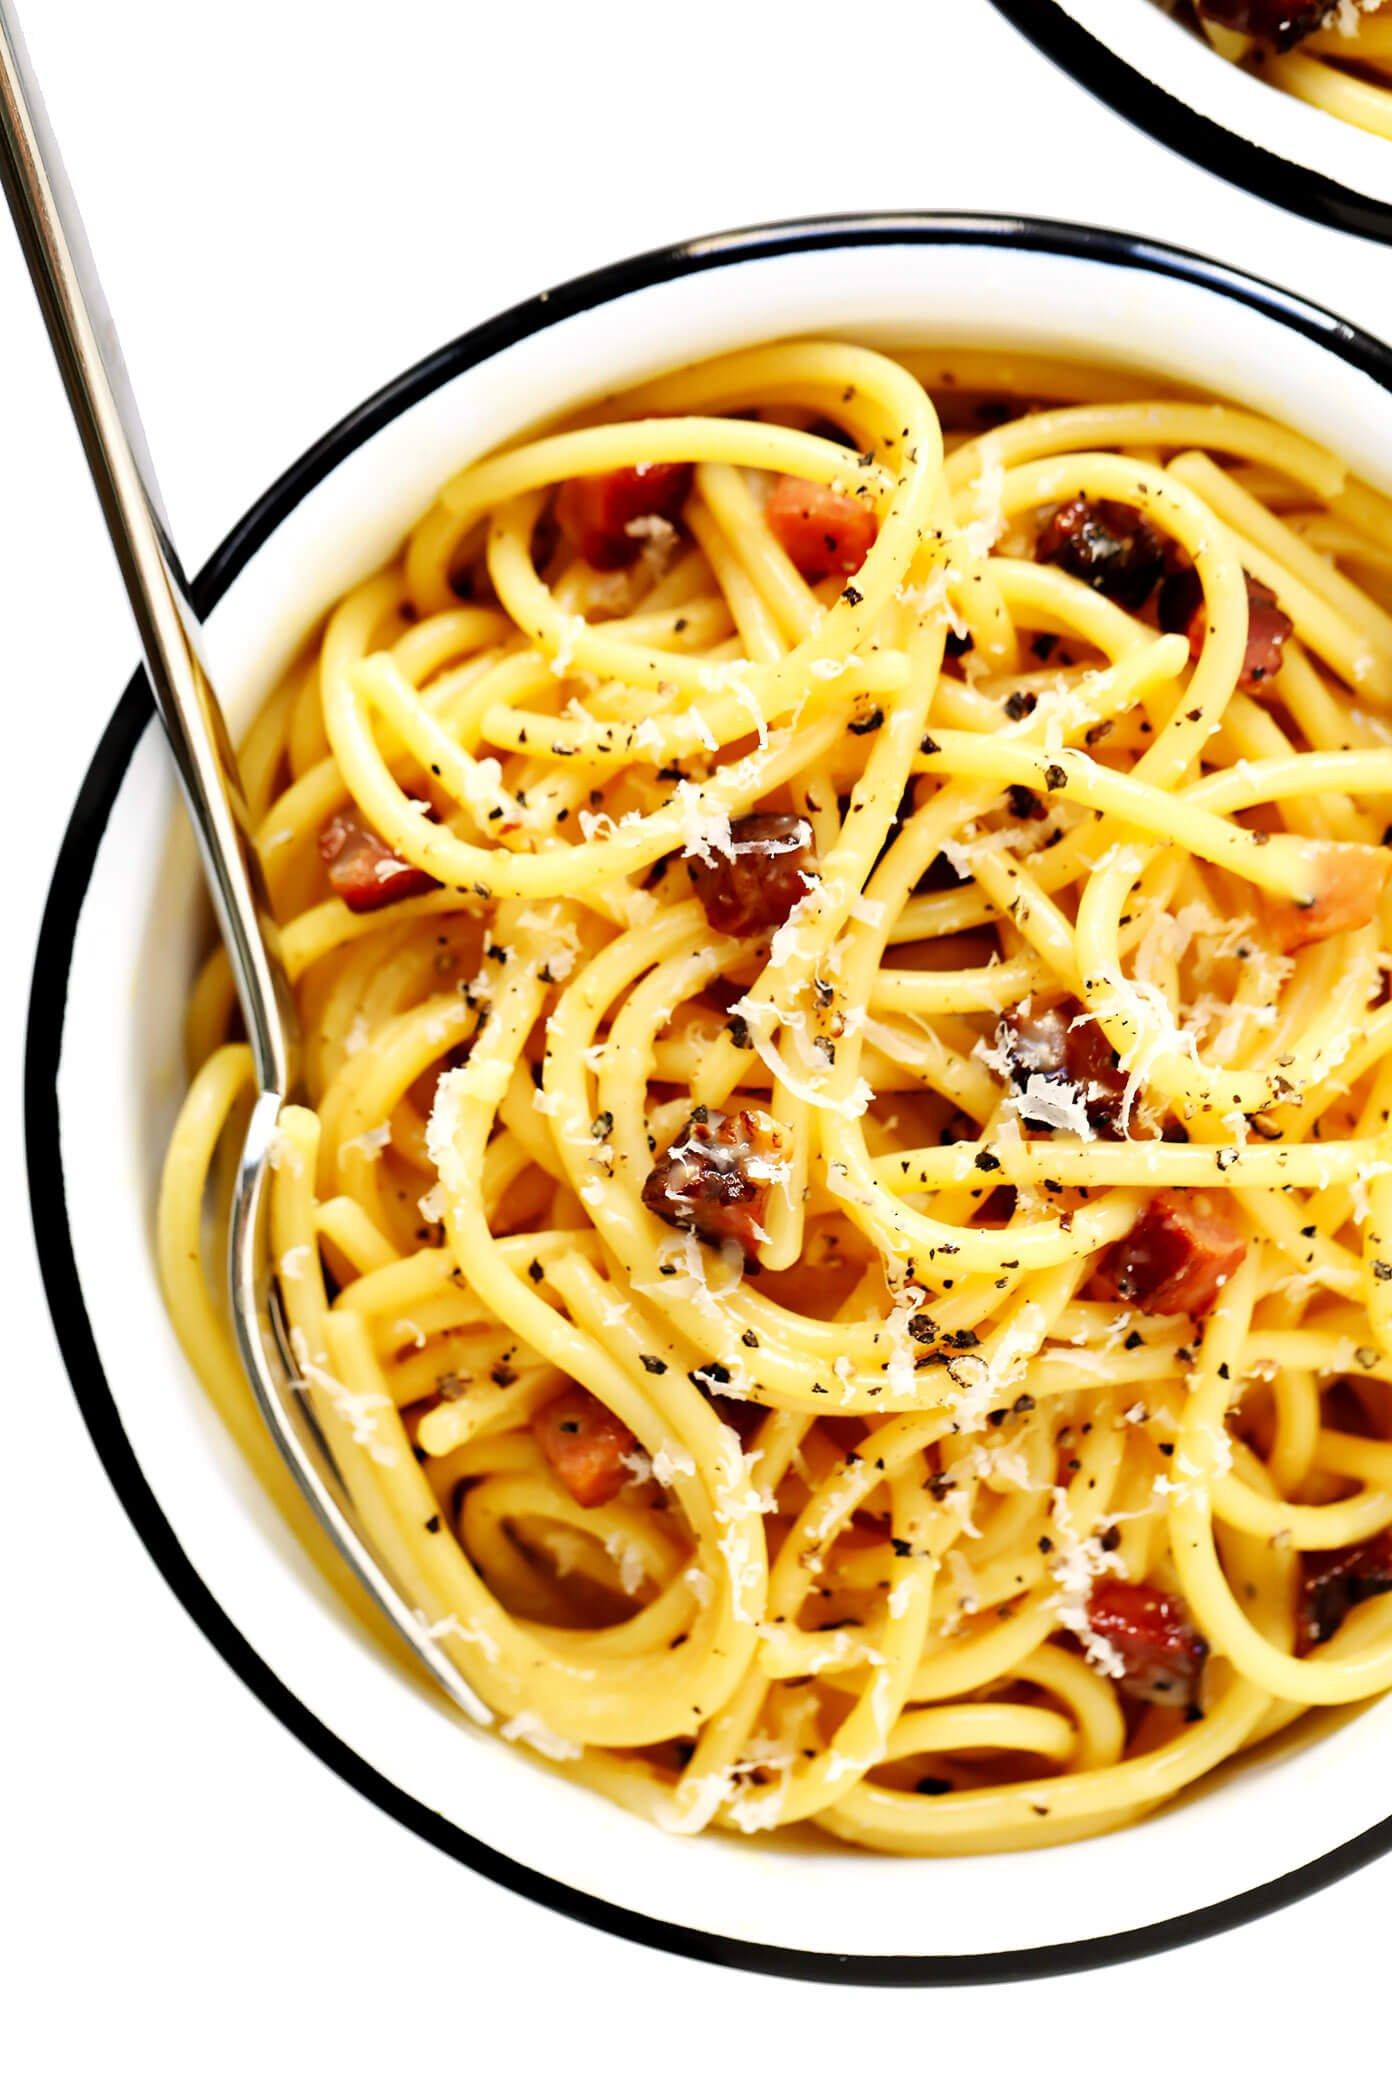 Spaghetti Carbonara in Serving Bowl with Parmesan